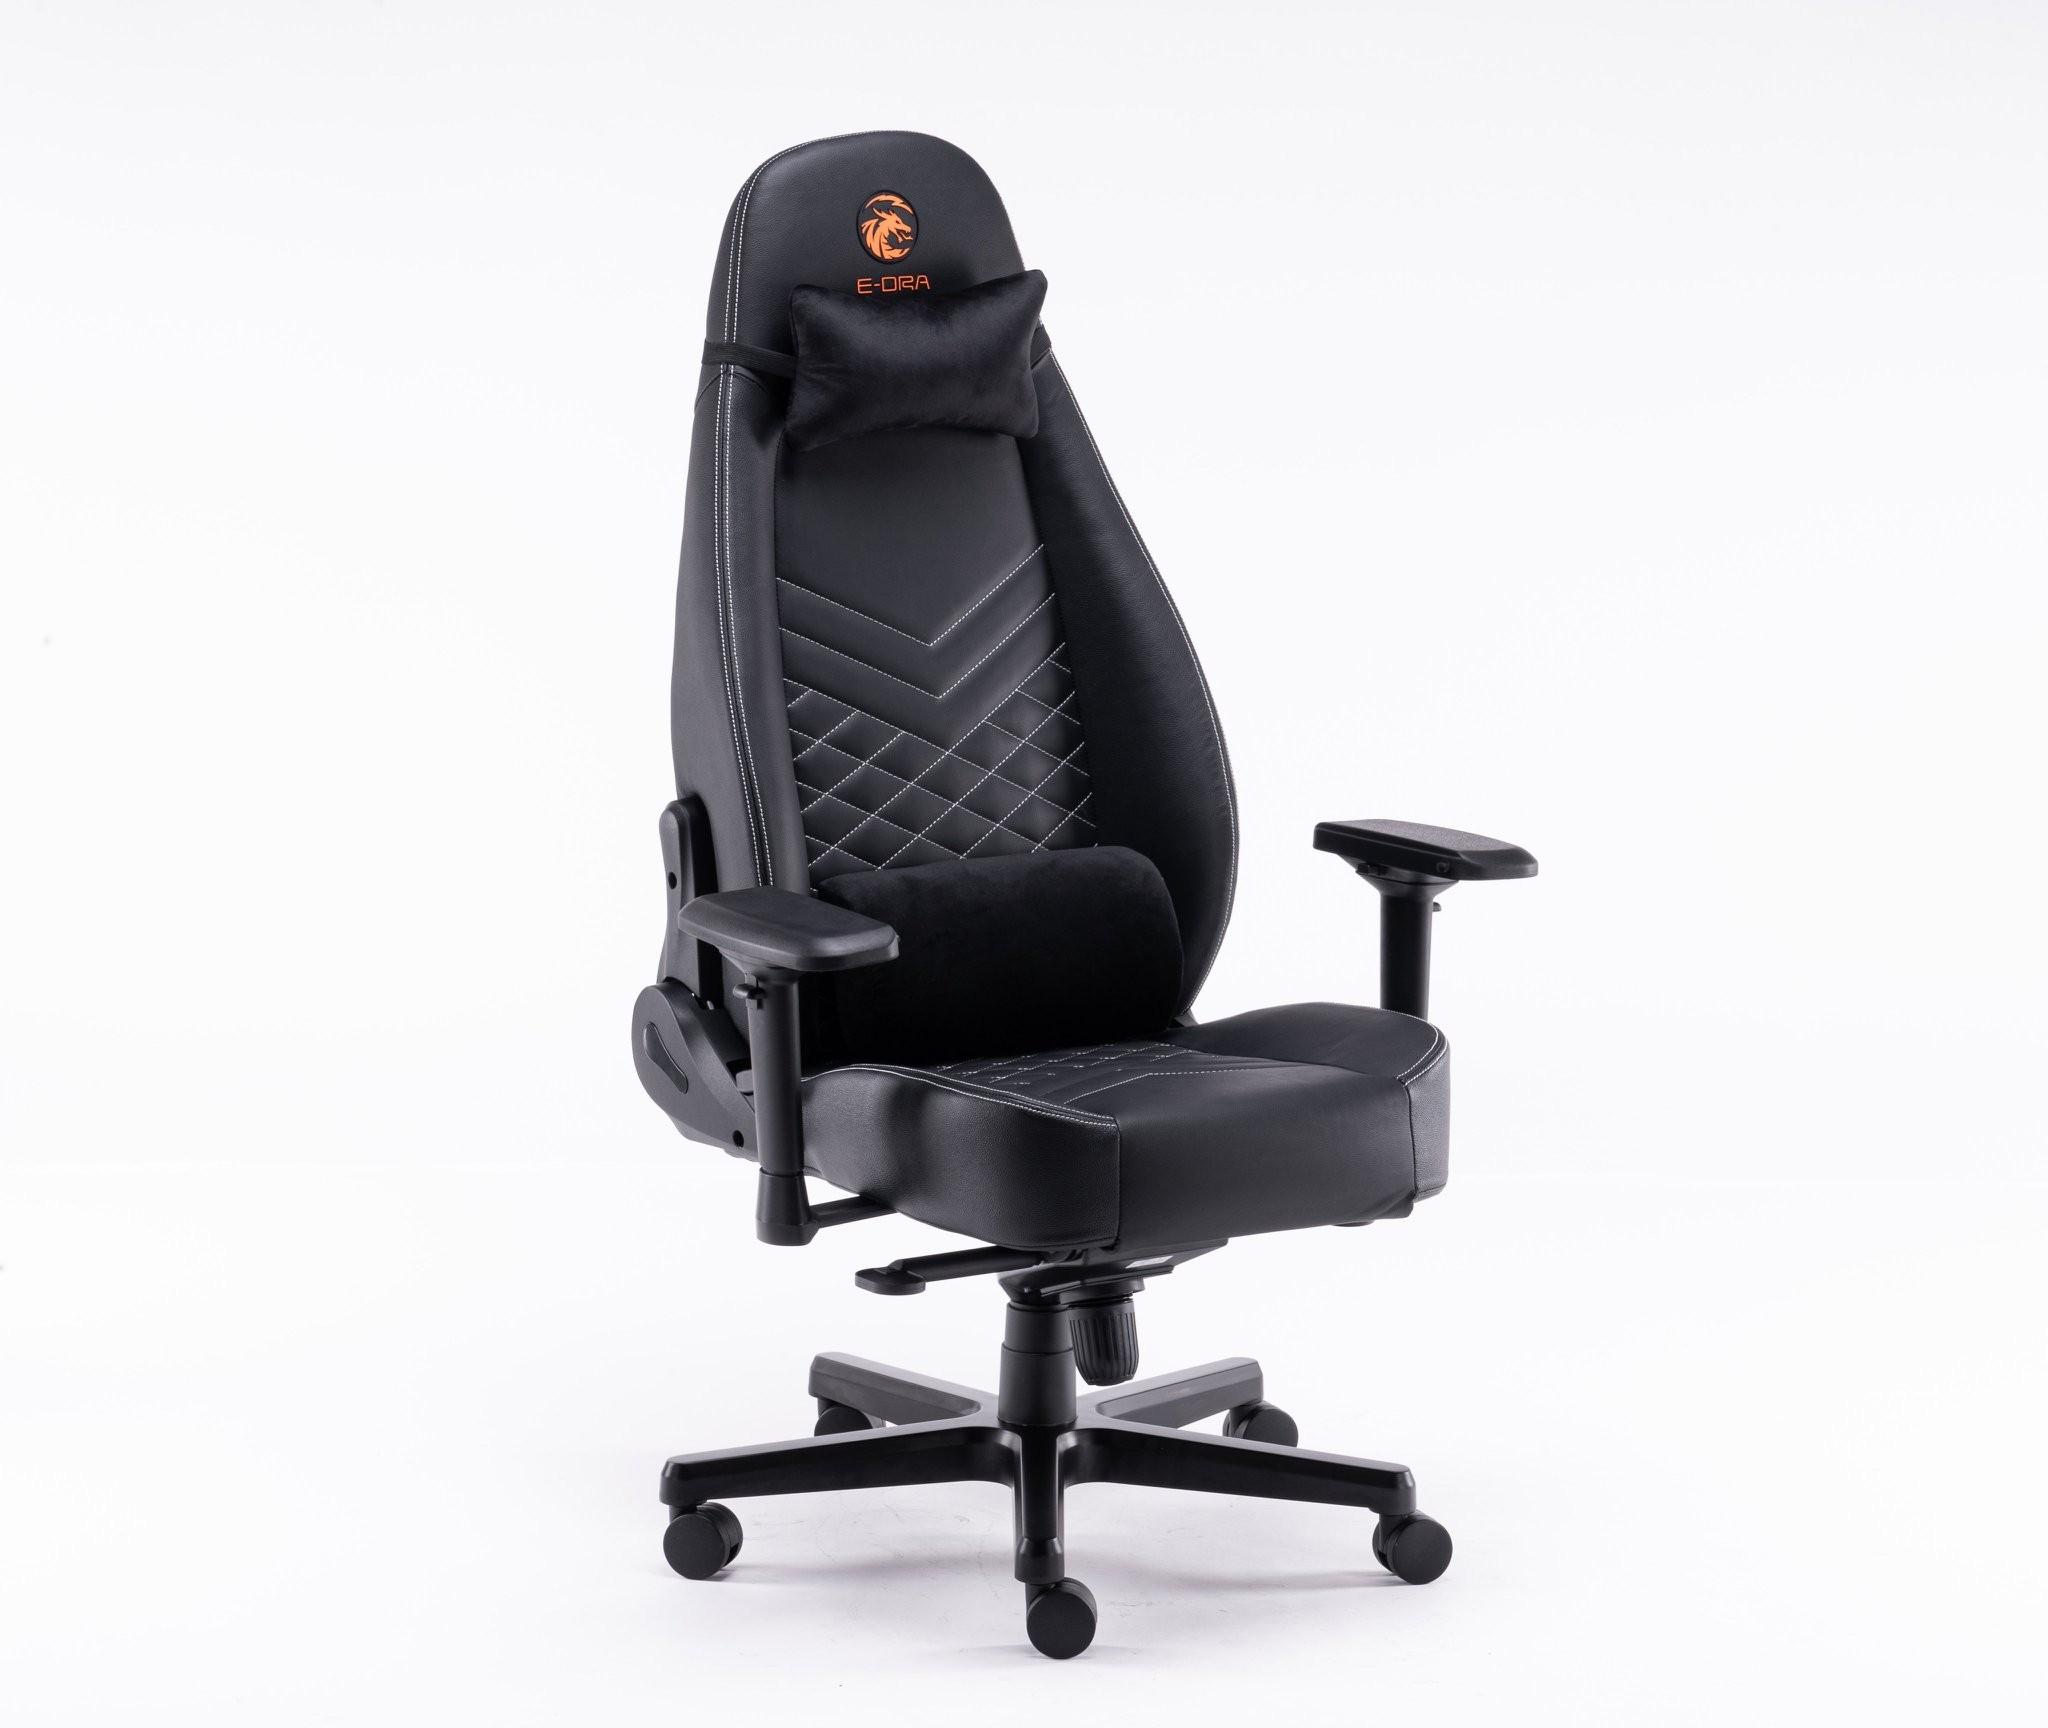 Ghế E-Dra LUX Big Boss EGC2021 Real Leather - Black - Da Thật